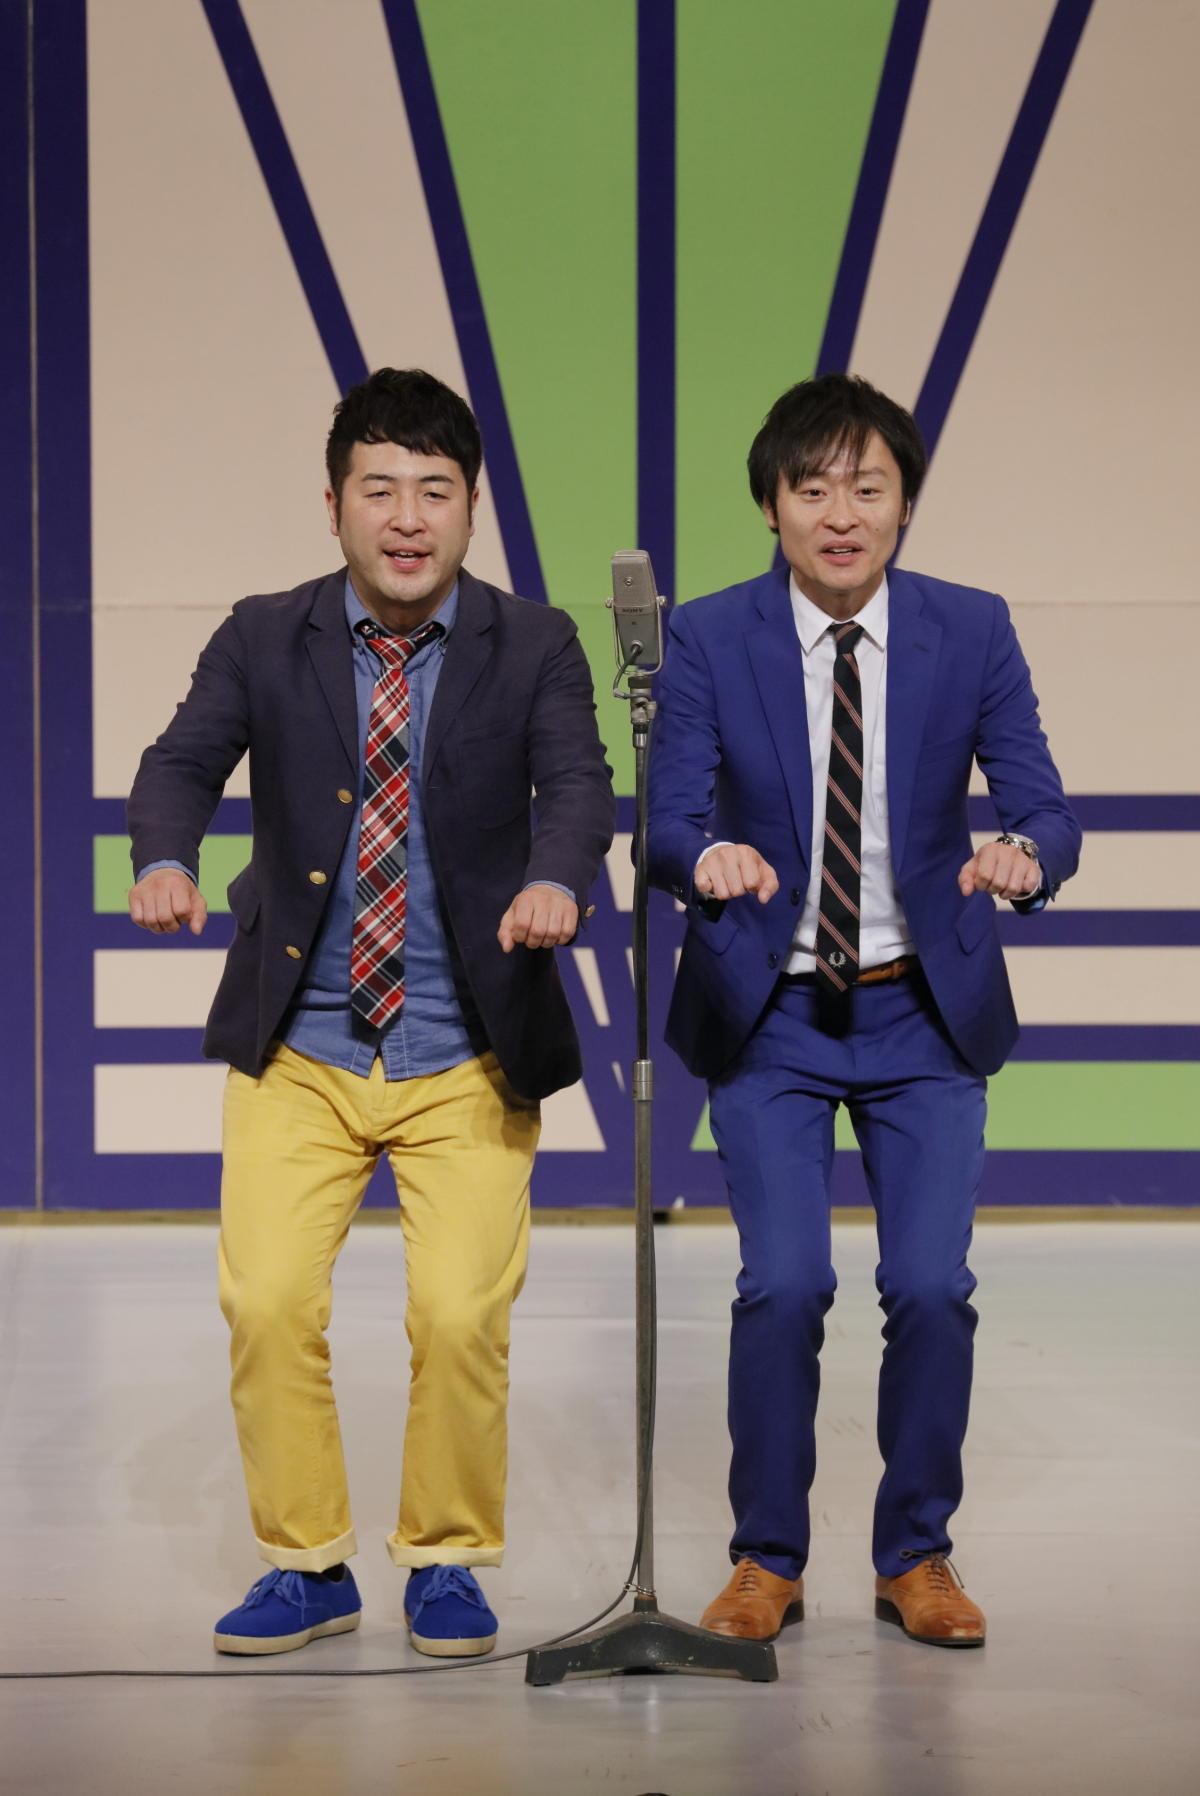 http://news.yoshimoto.co.jp/20180311220320-e0d9ccd653be3ebc369048bc3f0f0e14c9b921a6.jpg